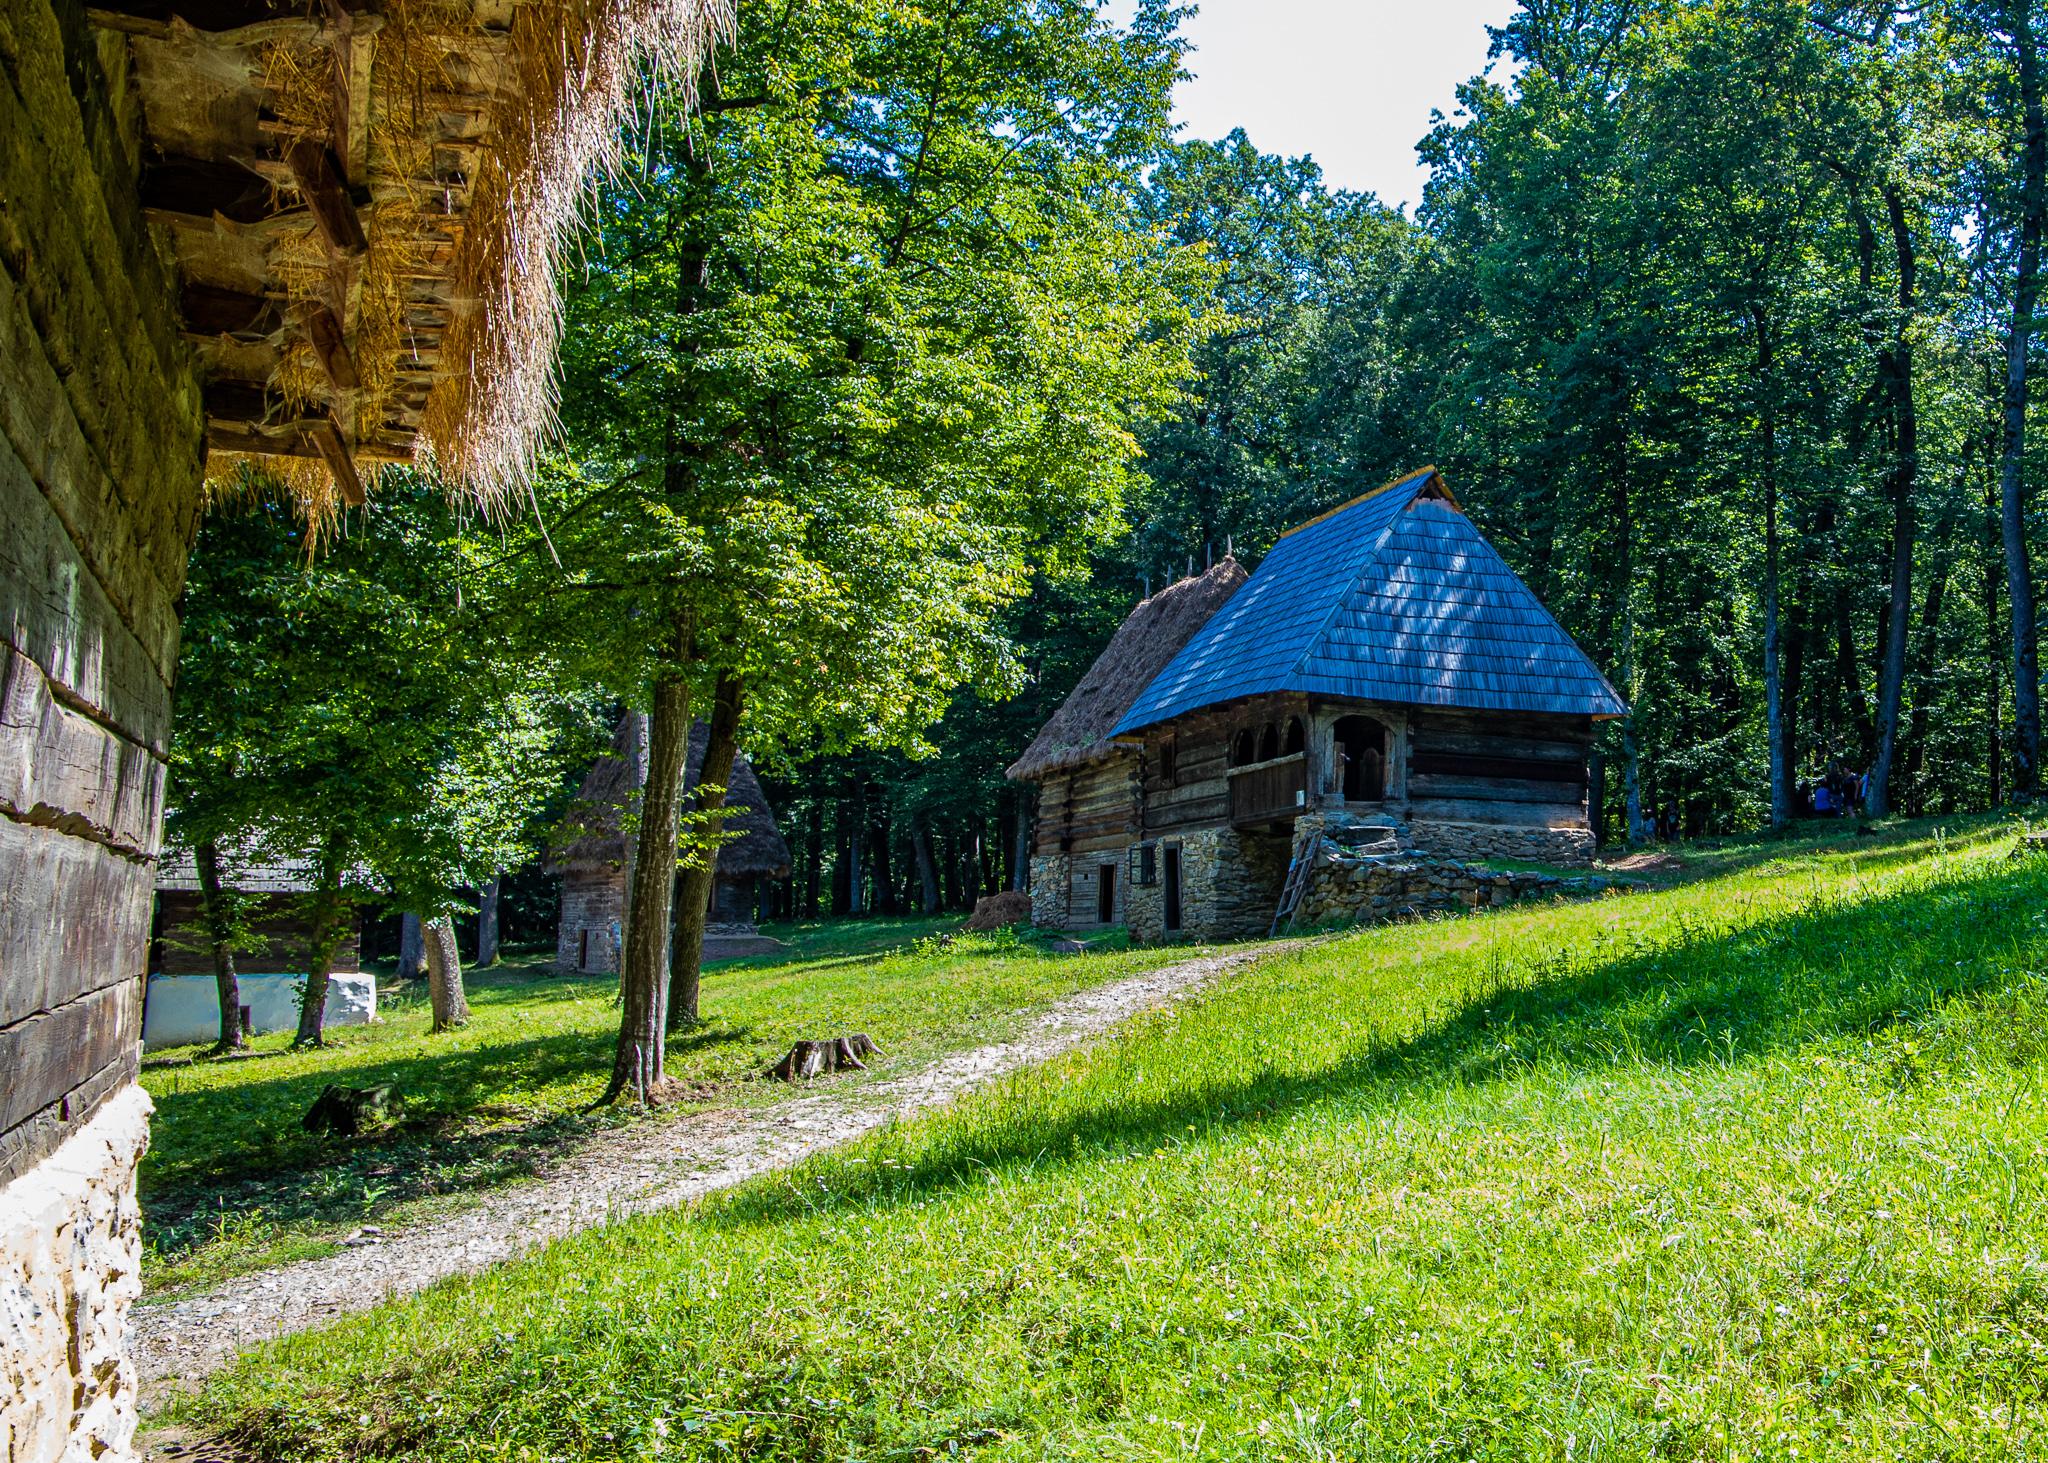 Old Transylvanian houses